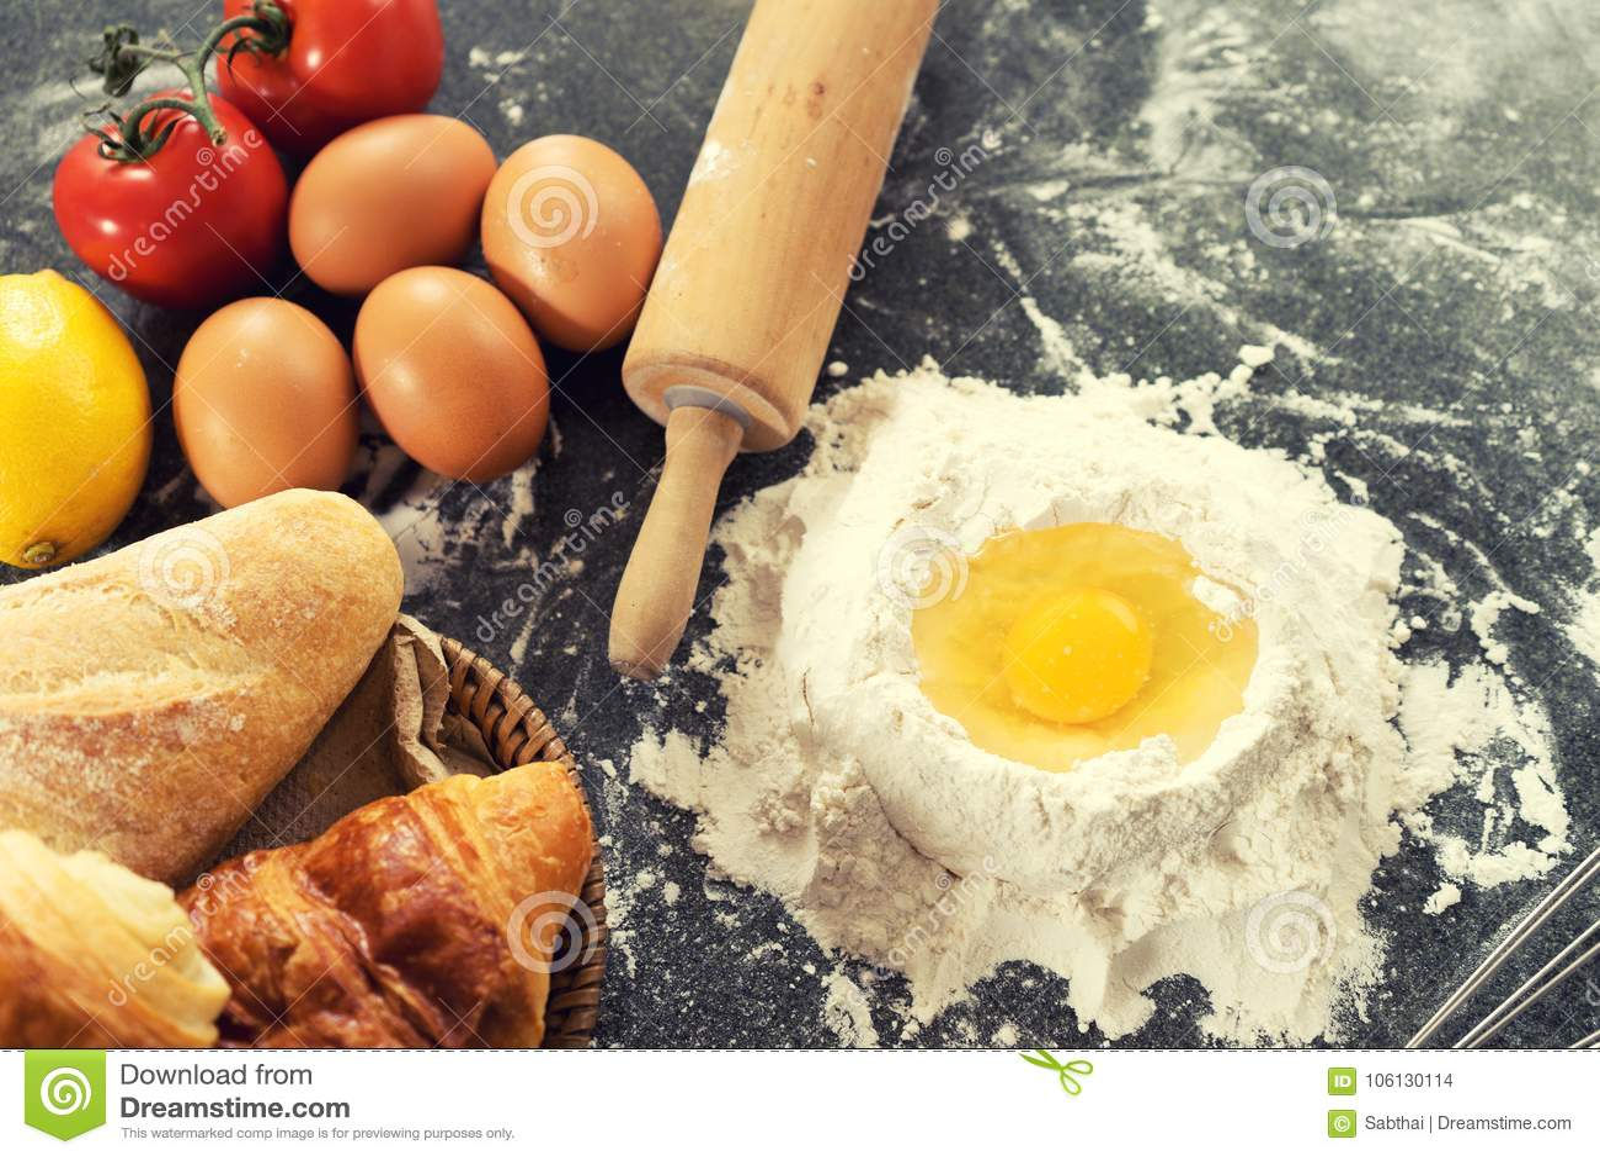 Bakery Raw Material Prepare Bake Cake Stock Photo Image